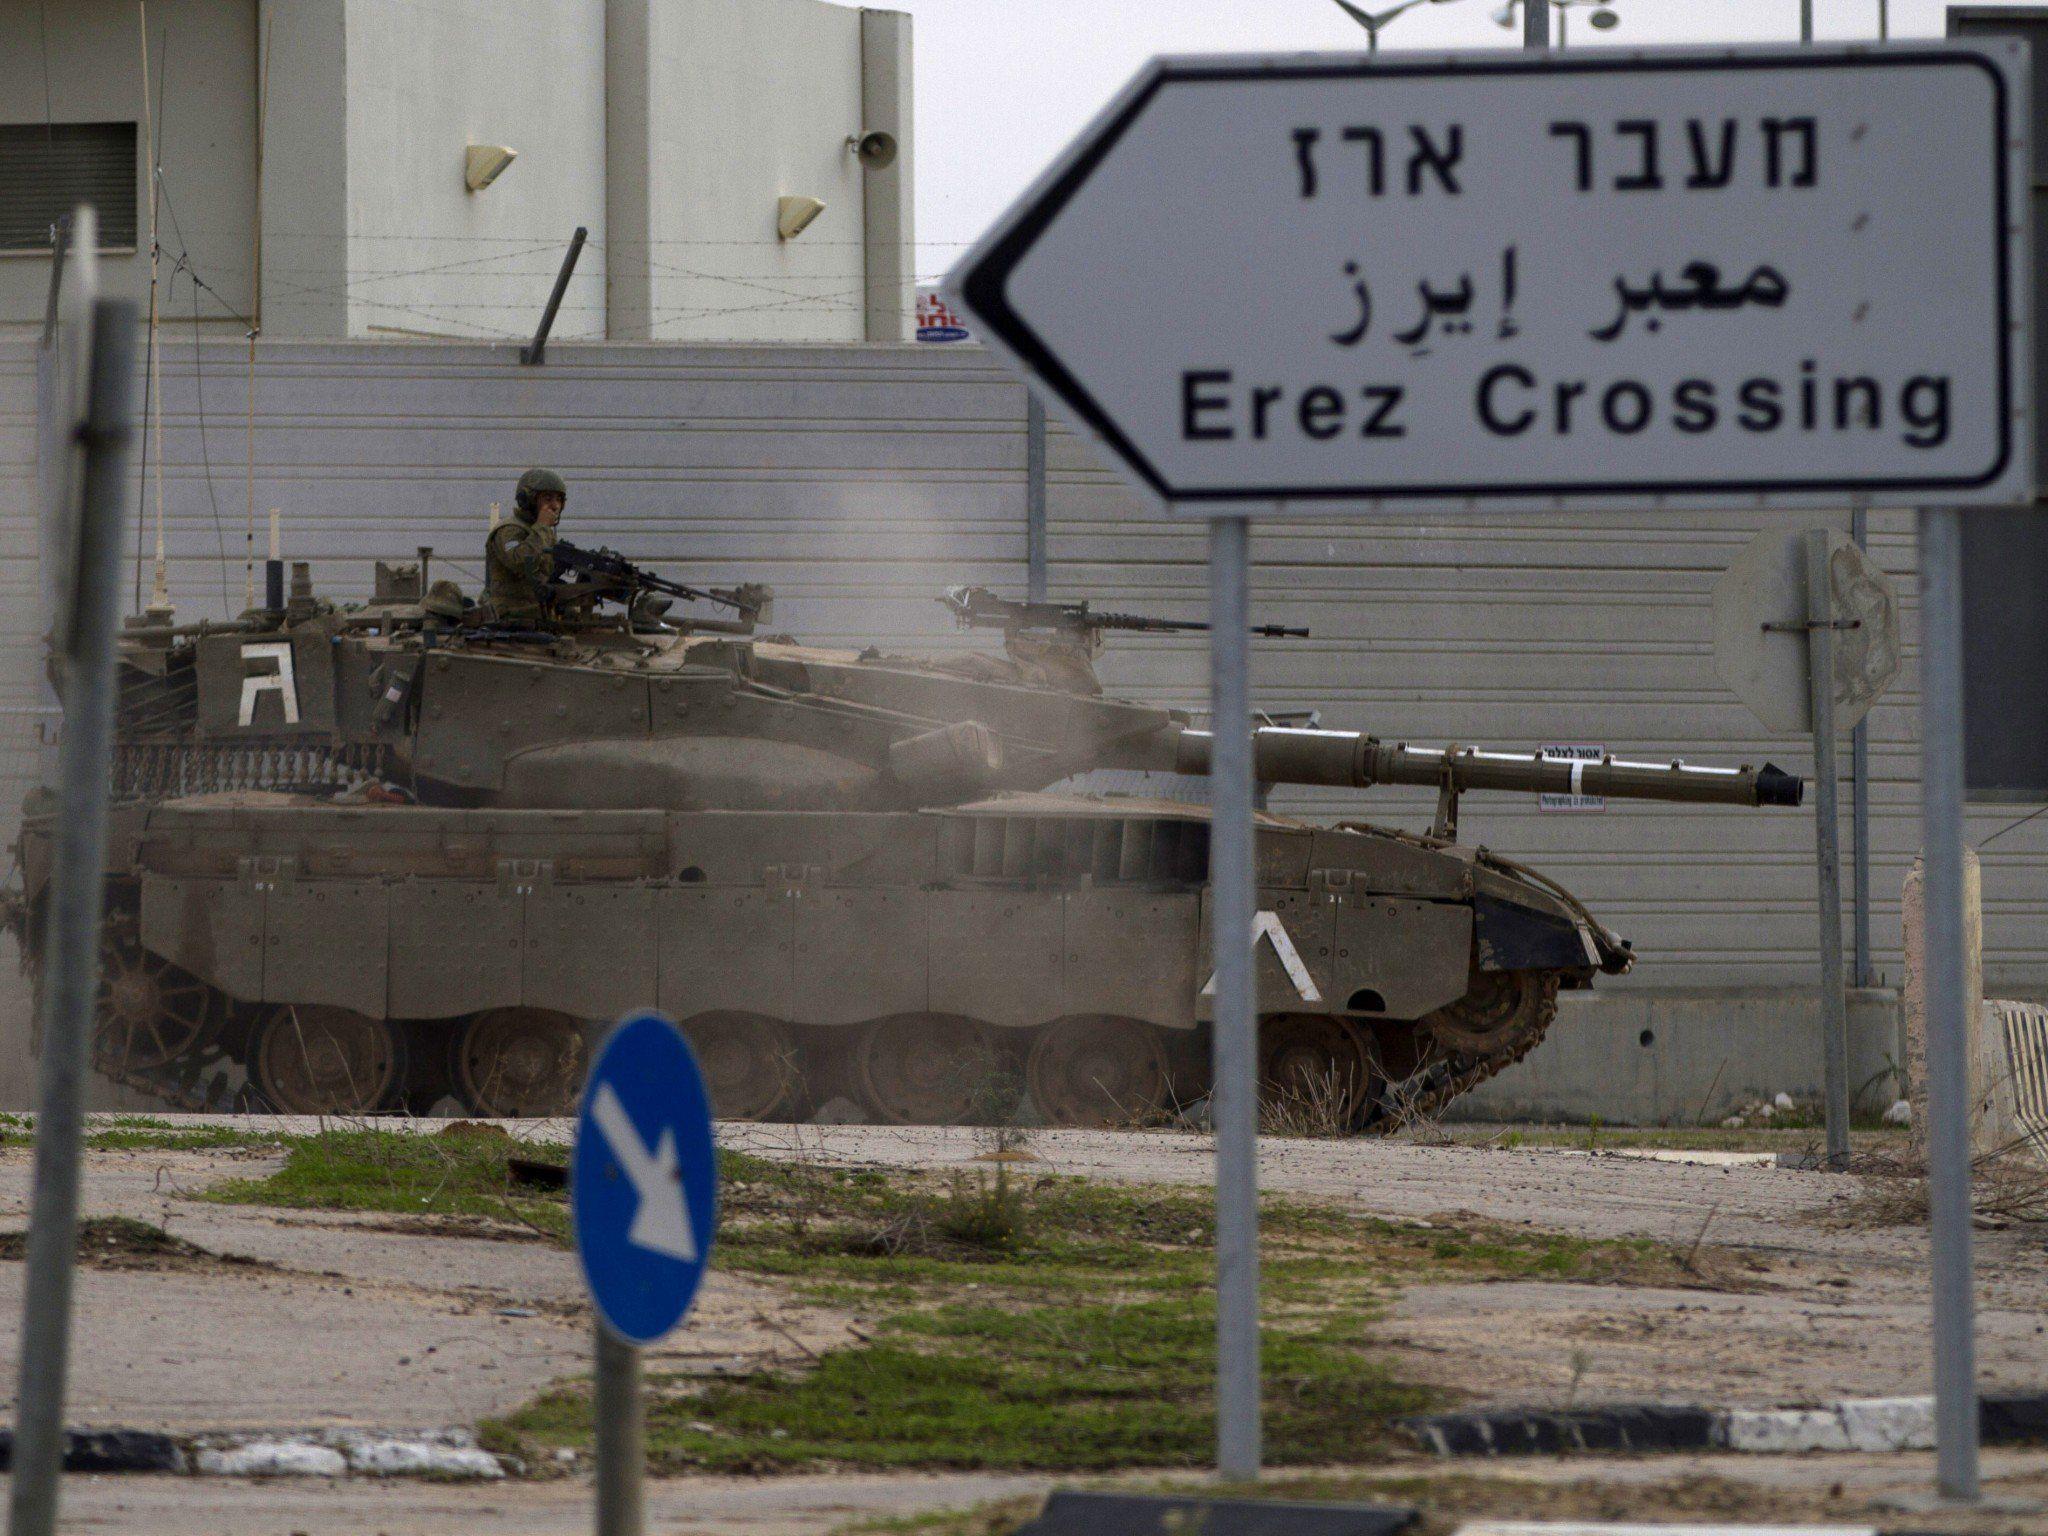 Zwei zentrale Übergänge in den Gazastreifen geschlossen.